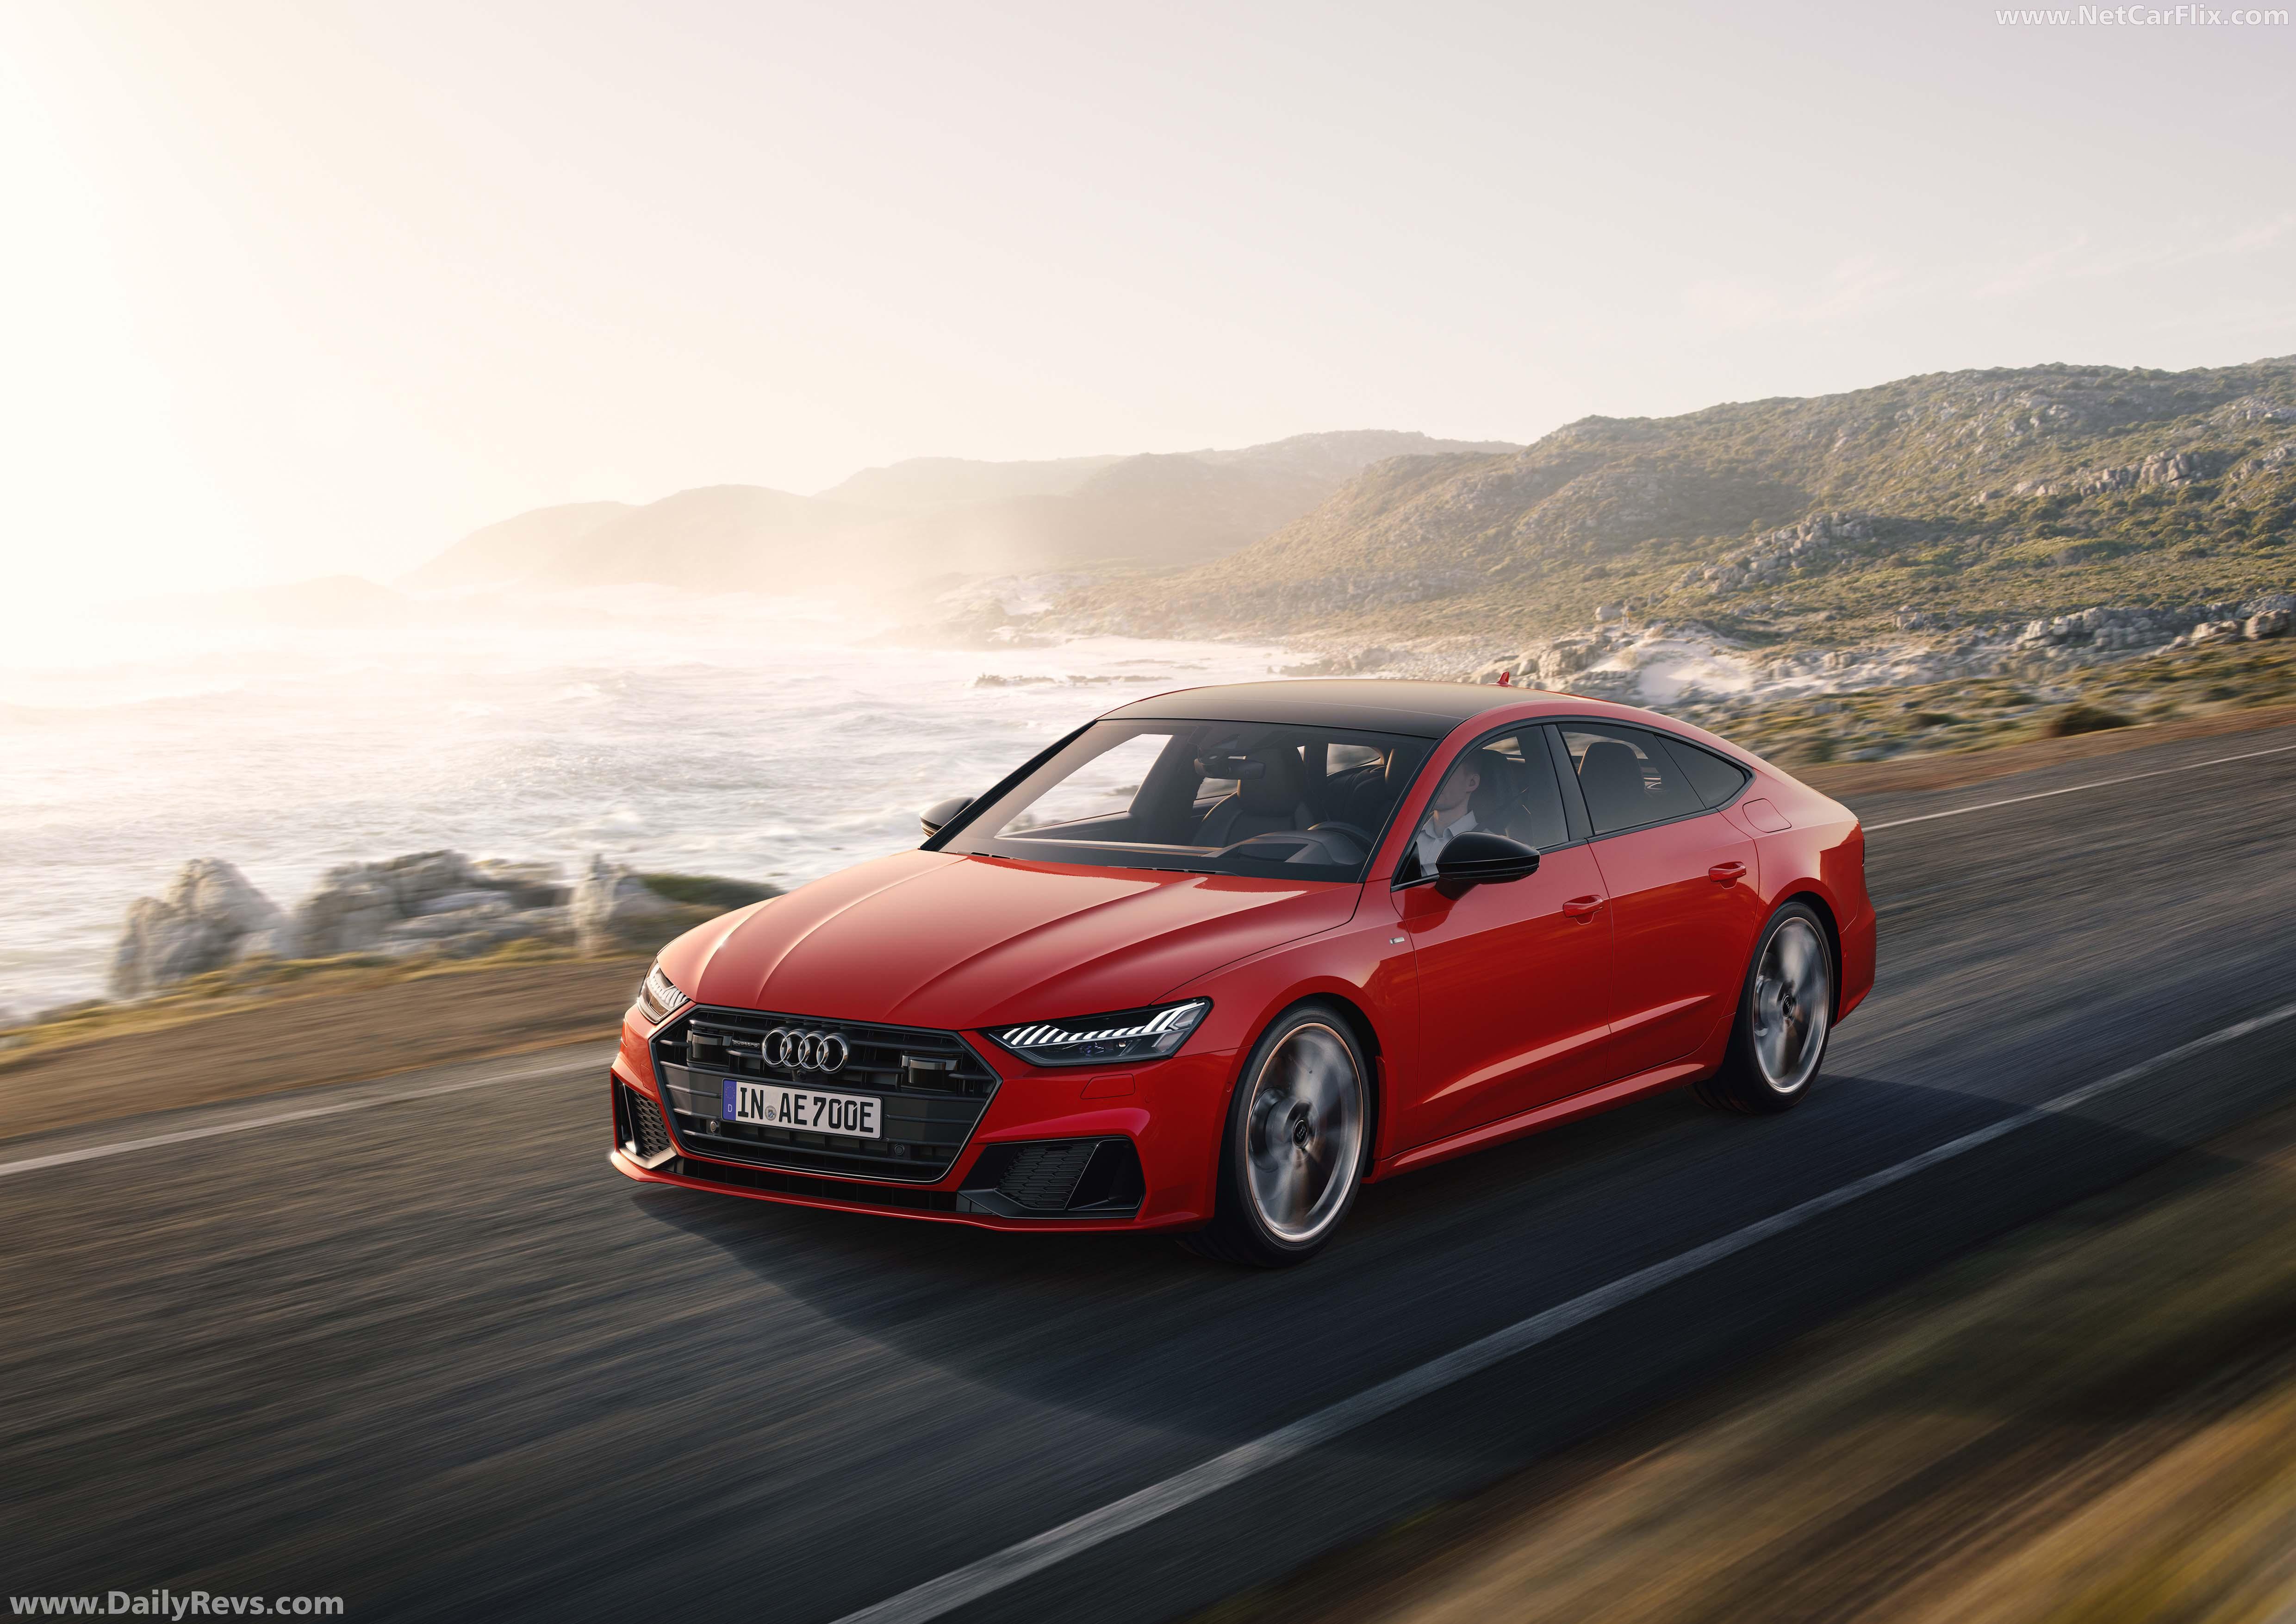 2020 Audi A7 Sportback 55 TFSI e Quattro - Pictures ...